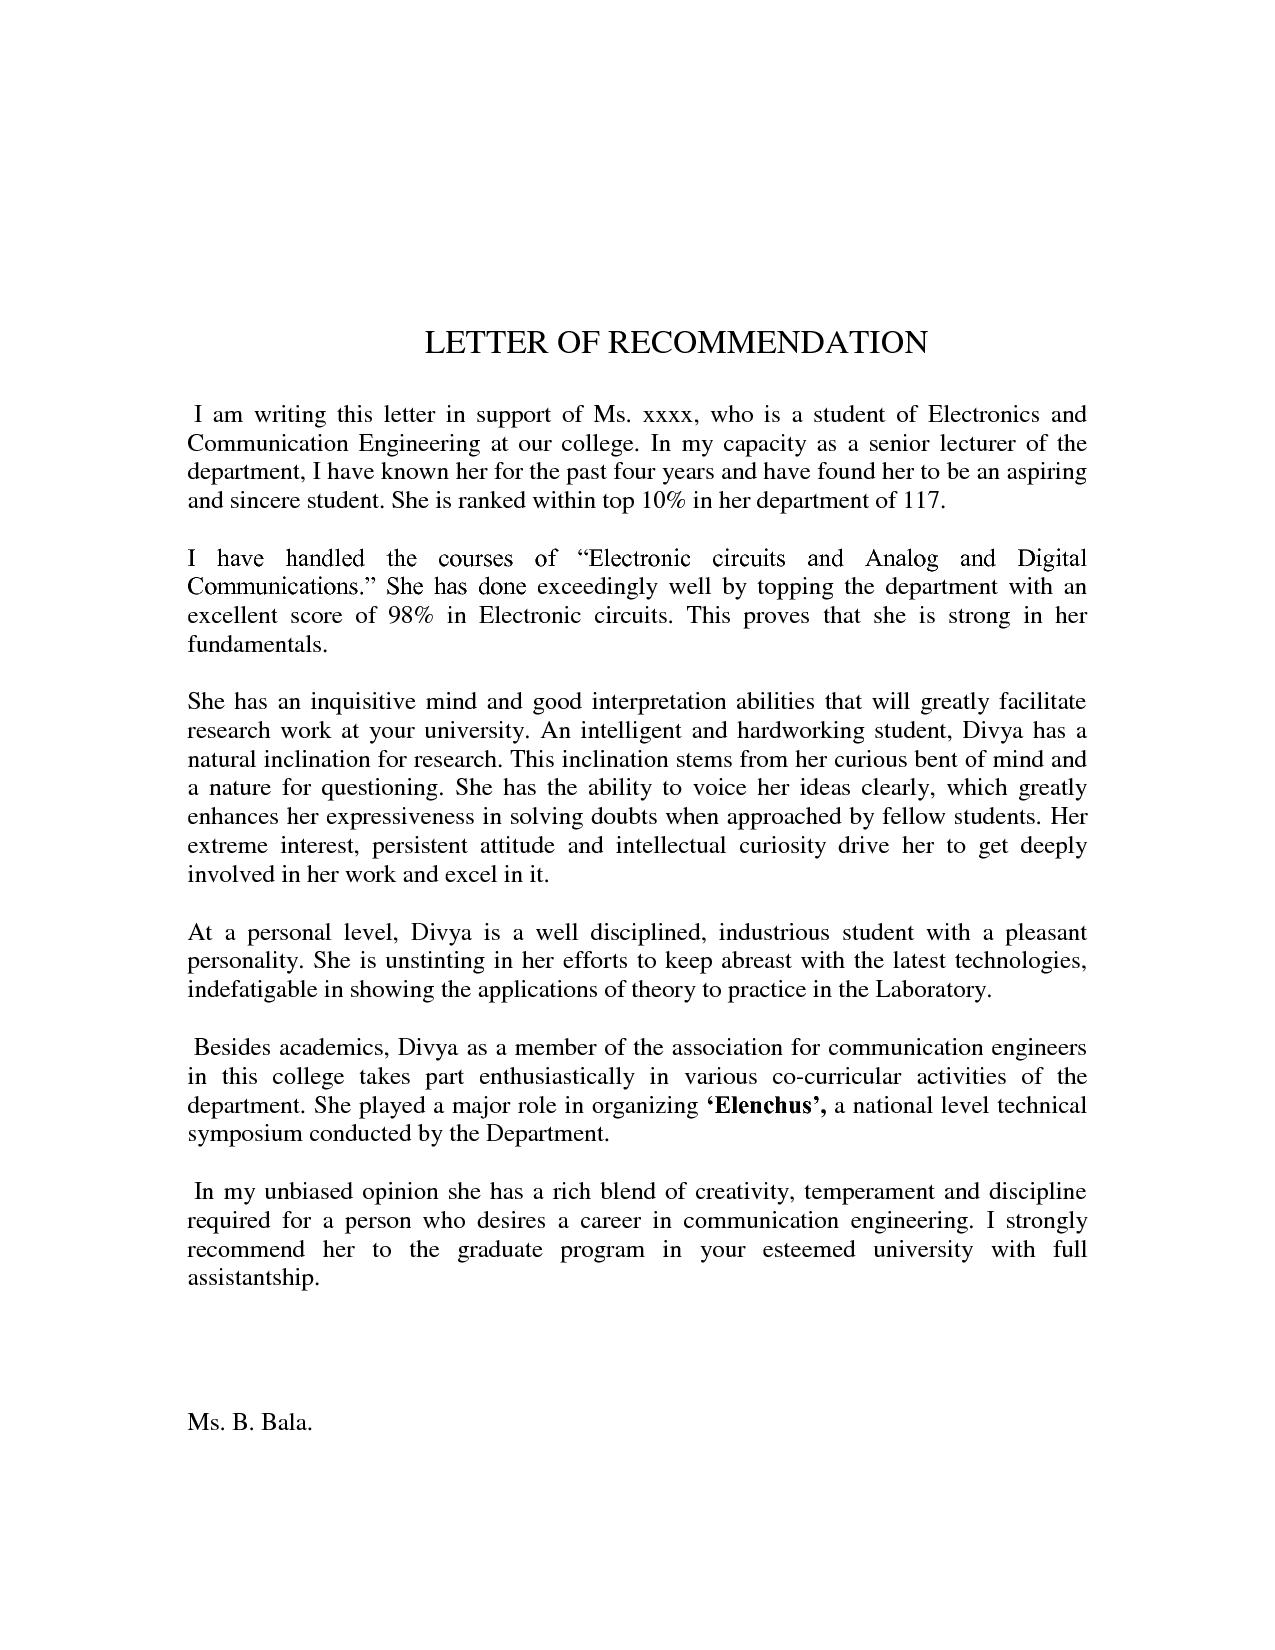 009 Sample Recommendation Letter For Student Skfgg6fi Essay Example Impressive Description Descriptive Topics College About A Pet Full